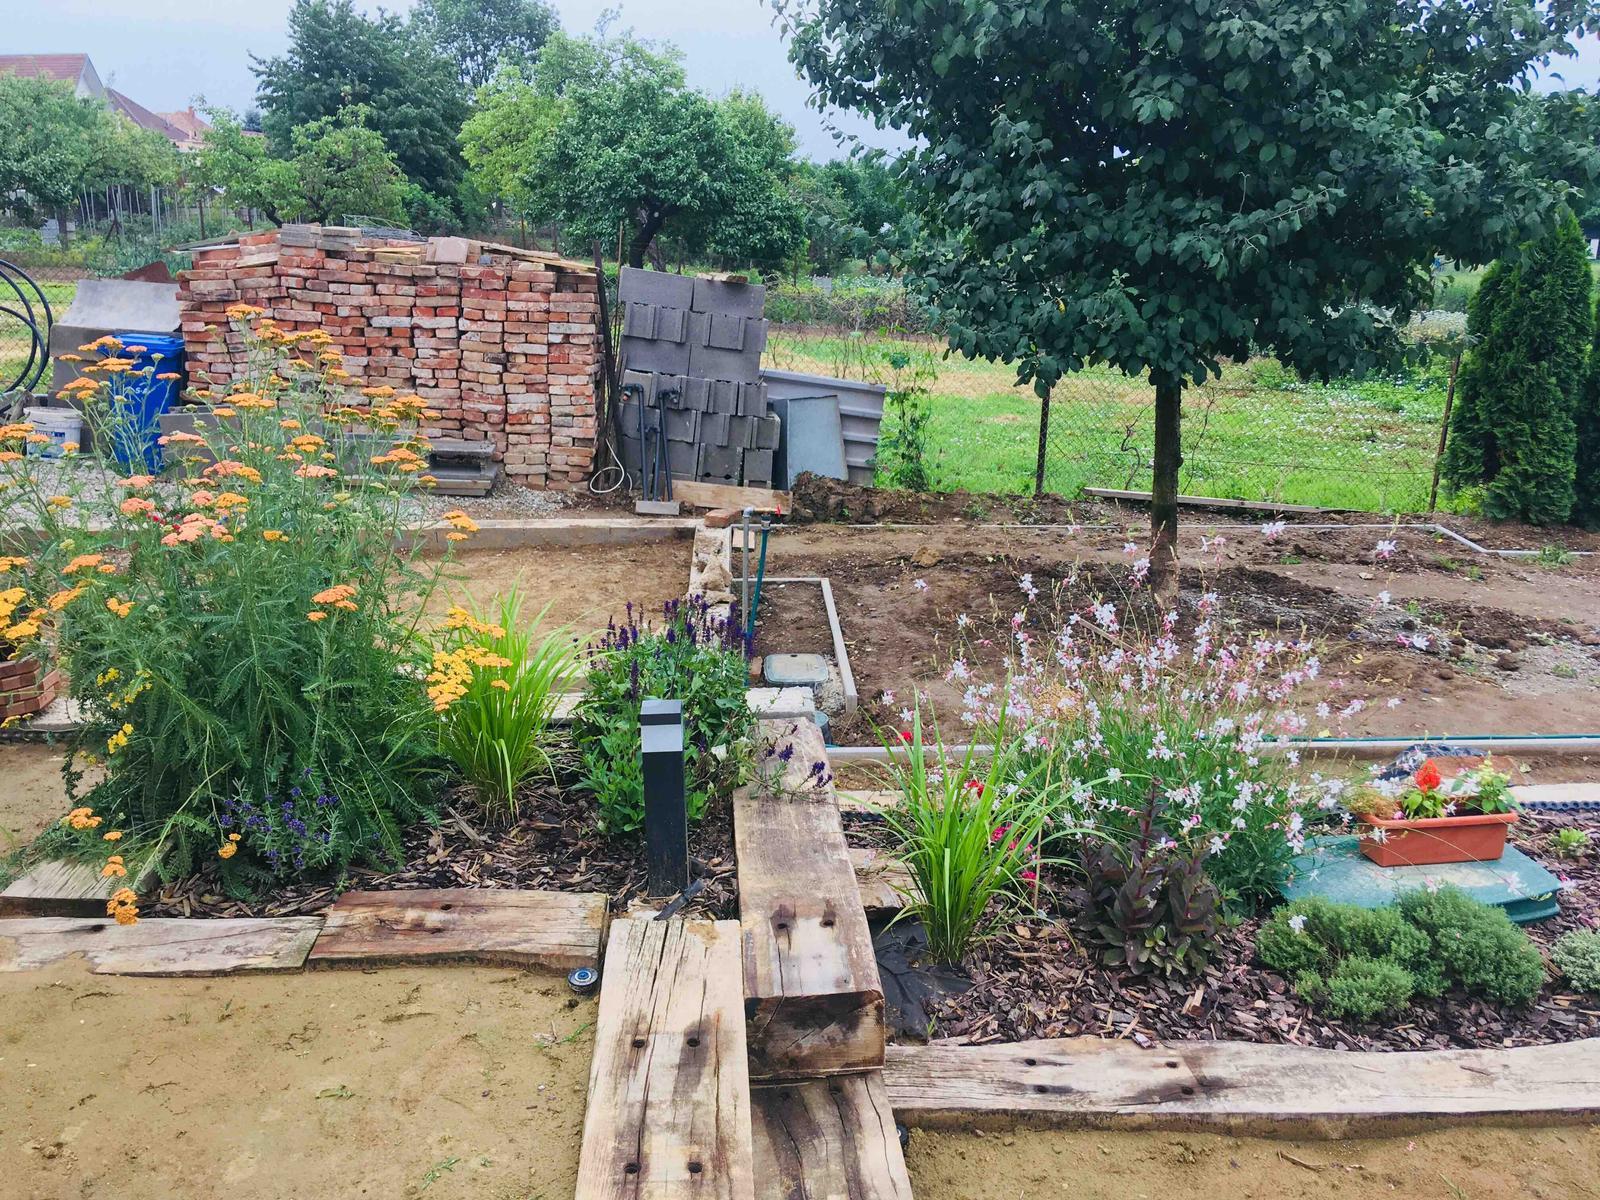 Názov stavby 3 - in da garden - v procese